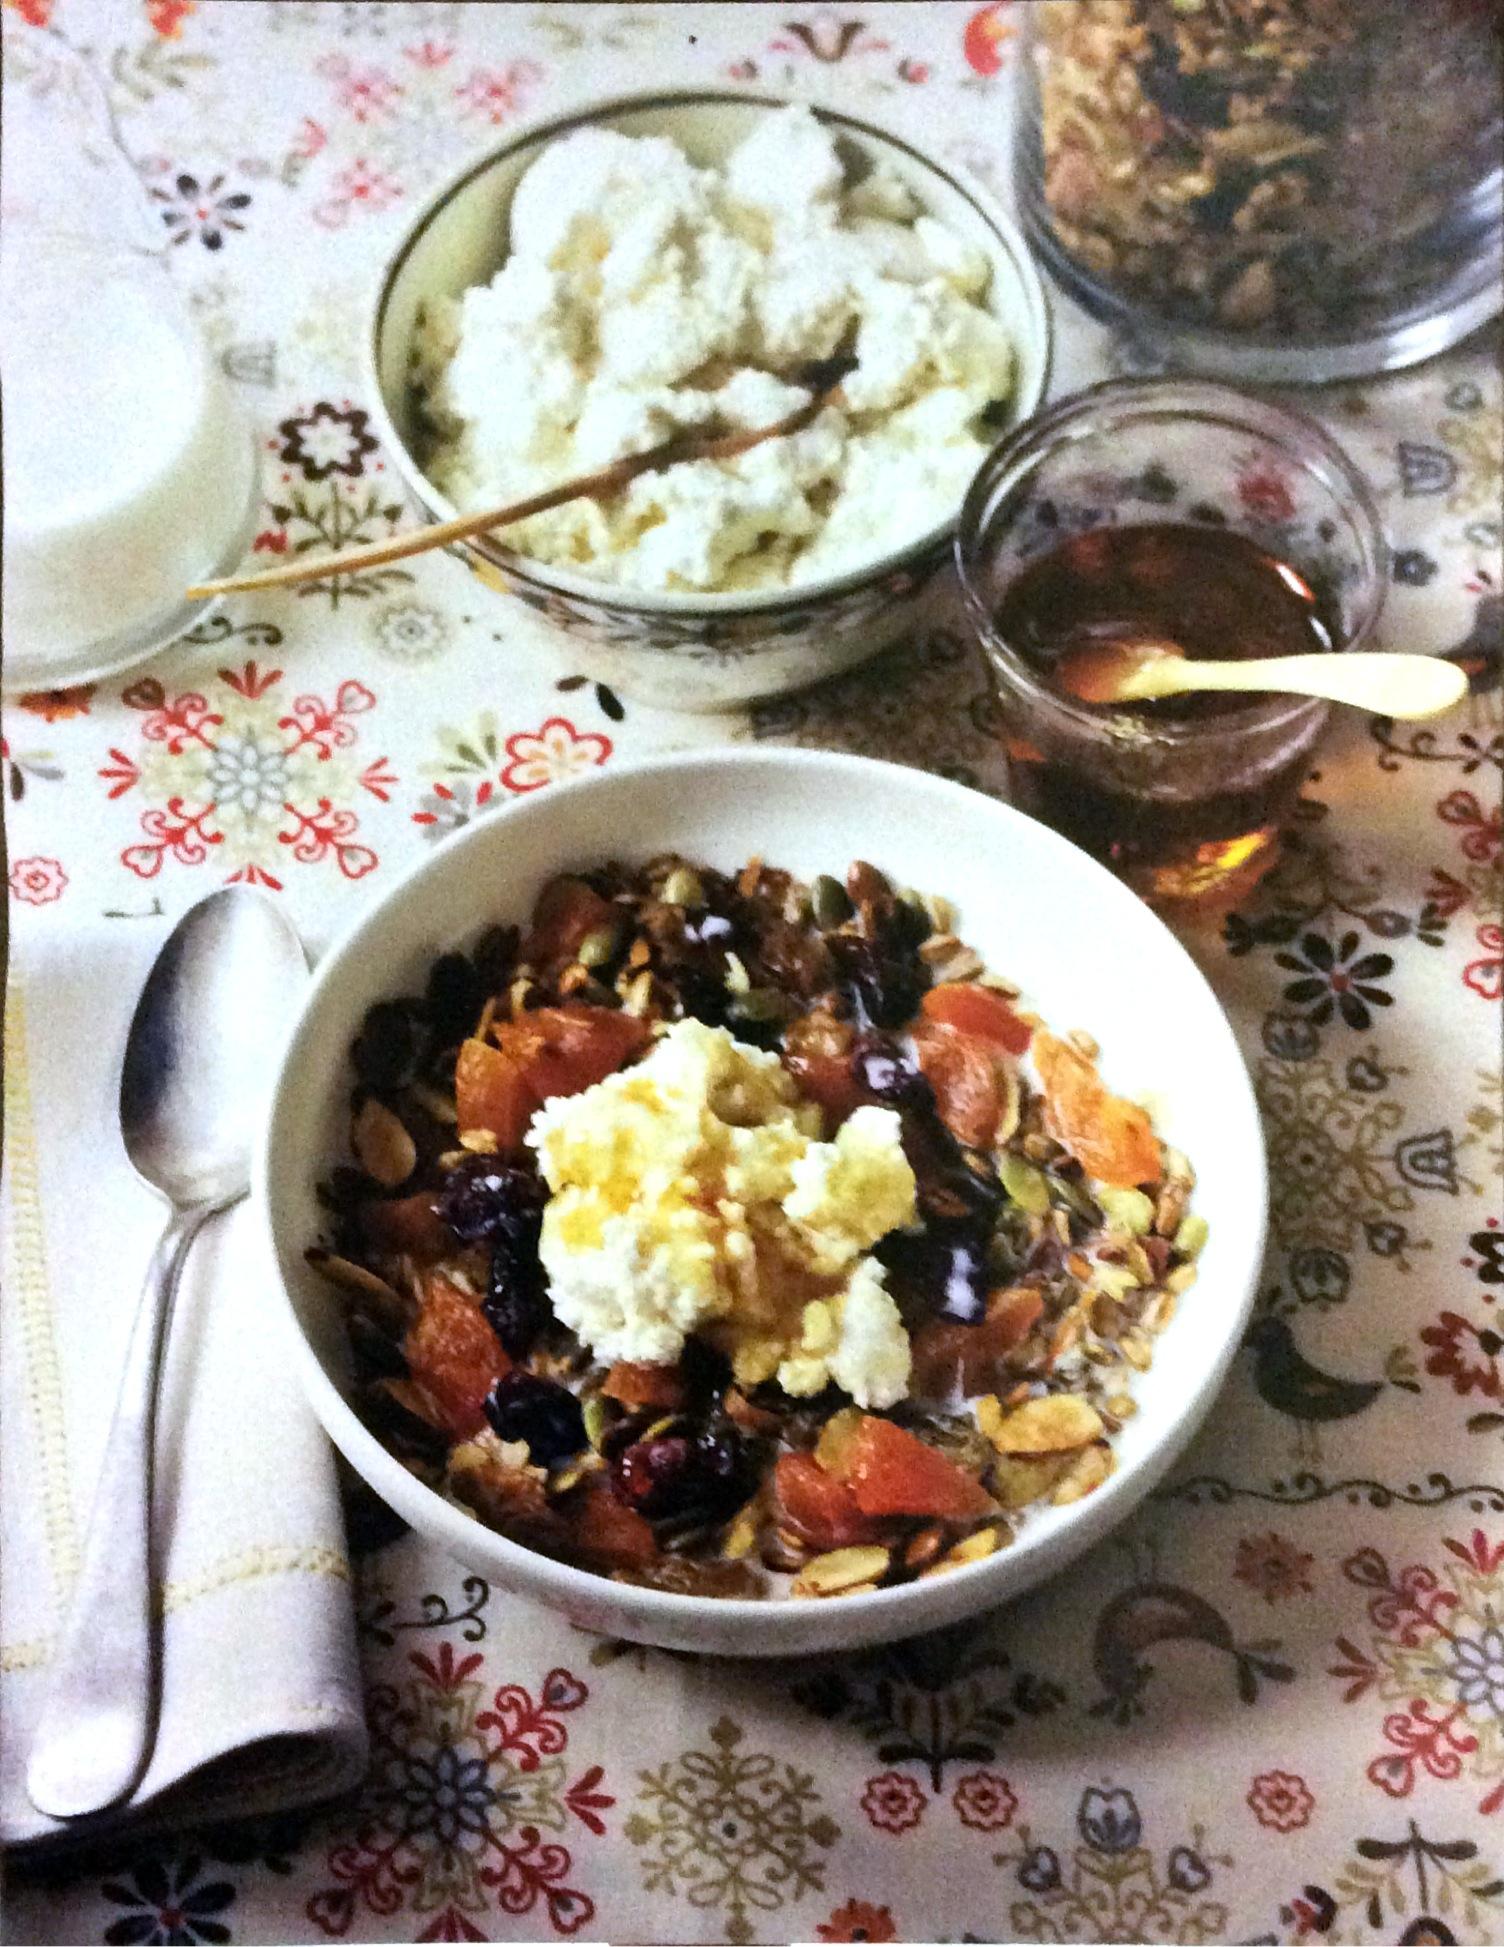 Marina M. PDF _Anne Burrell Own Your Kitchen_Page_11.jpg